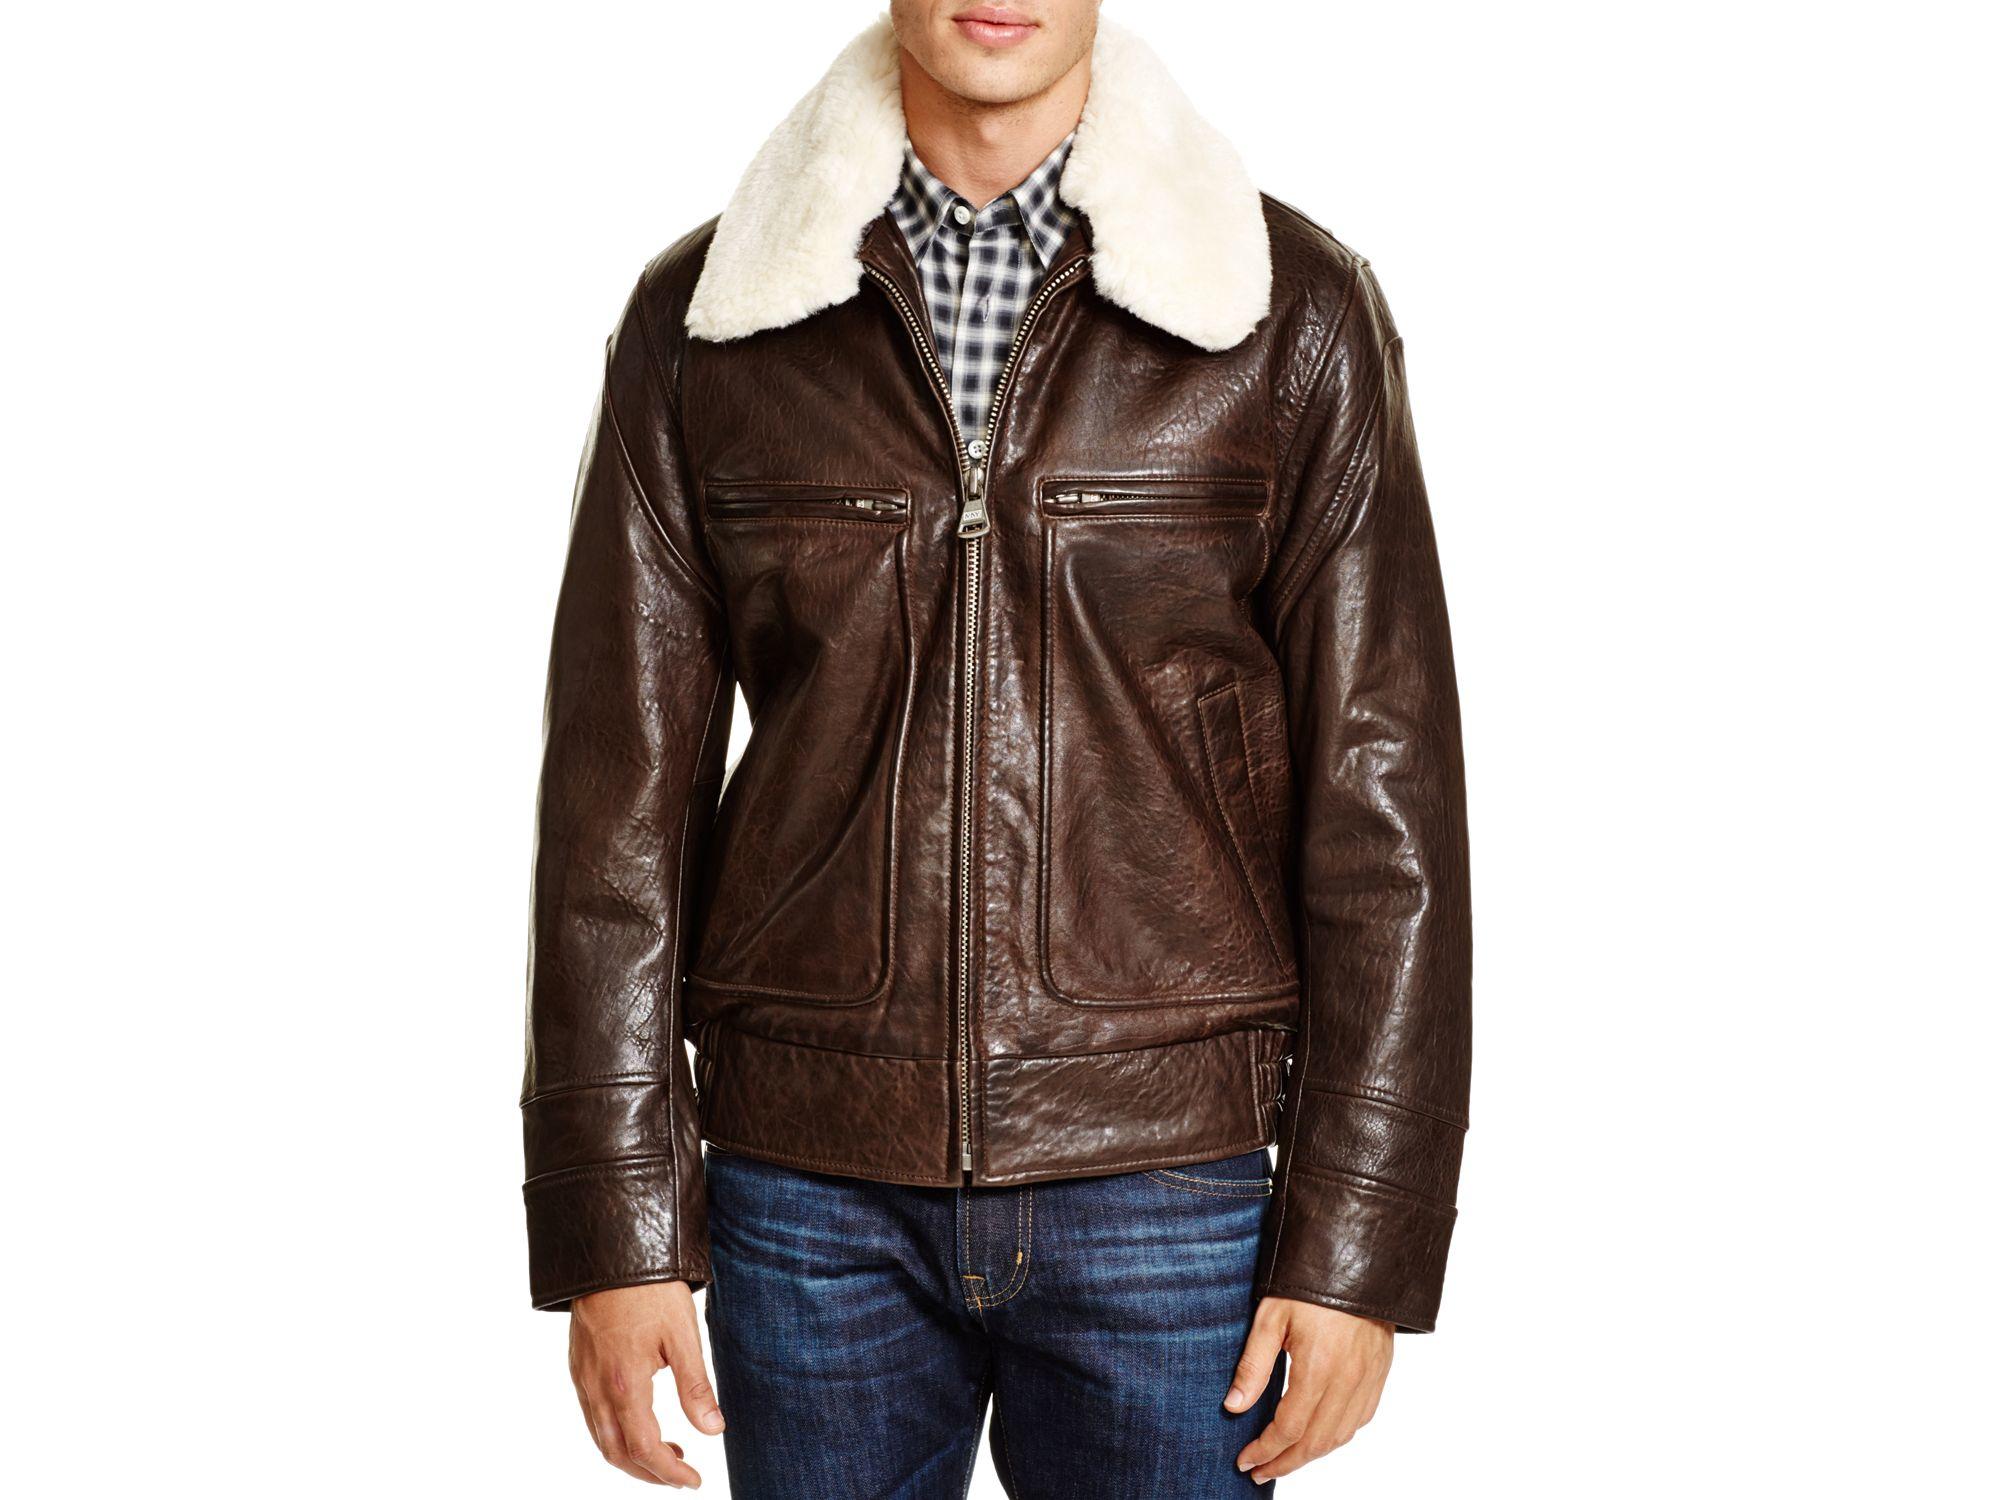 ee5011e49 Marc New York Brown Carmine Aviator Leather Bomber Jacket for men